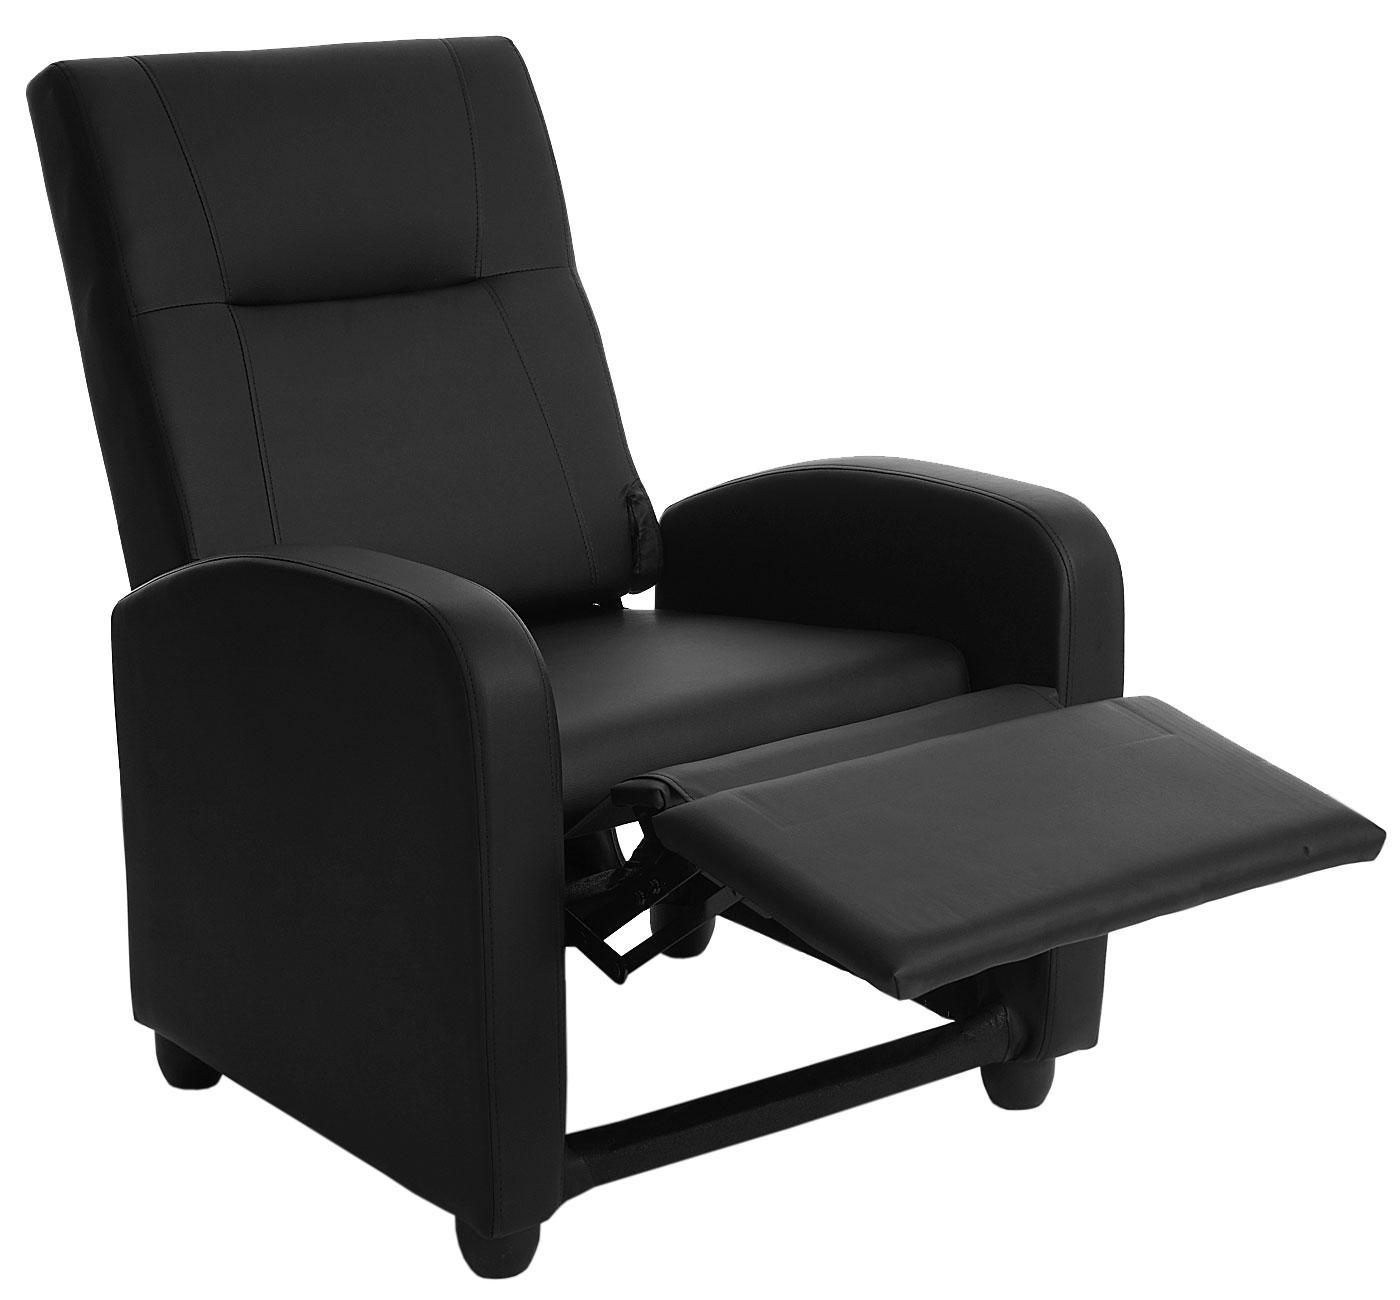 fernsehsessel dallas basic relaxsessel relaxliege sessel kunstleder schwarz ebay. Black Bedroom Furniture Sets. Home Design Ideas